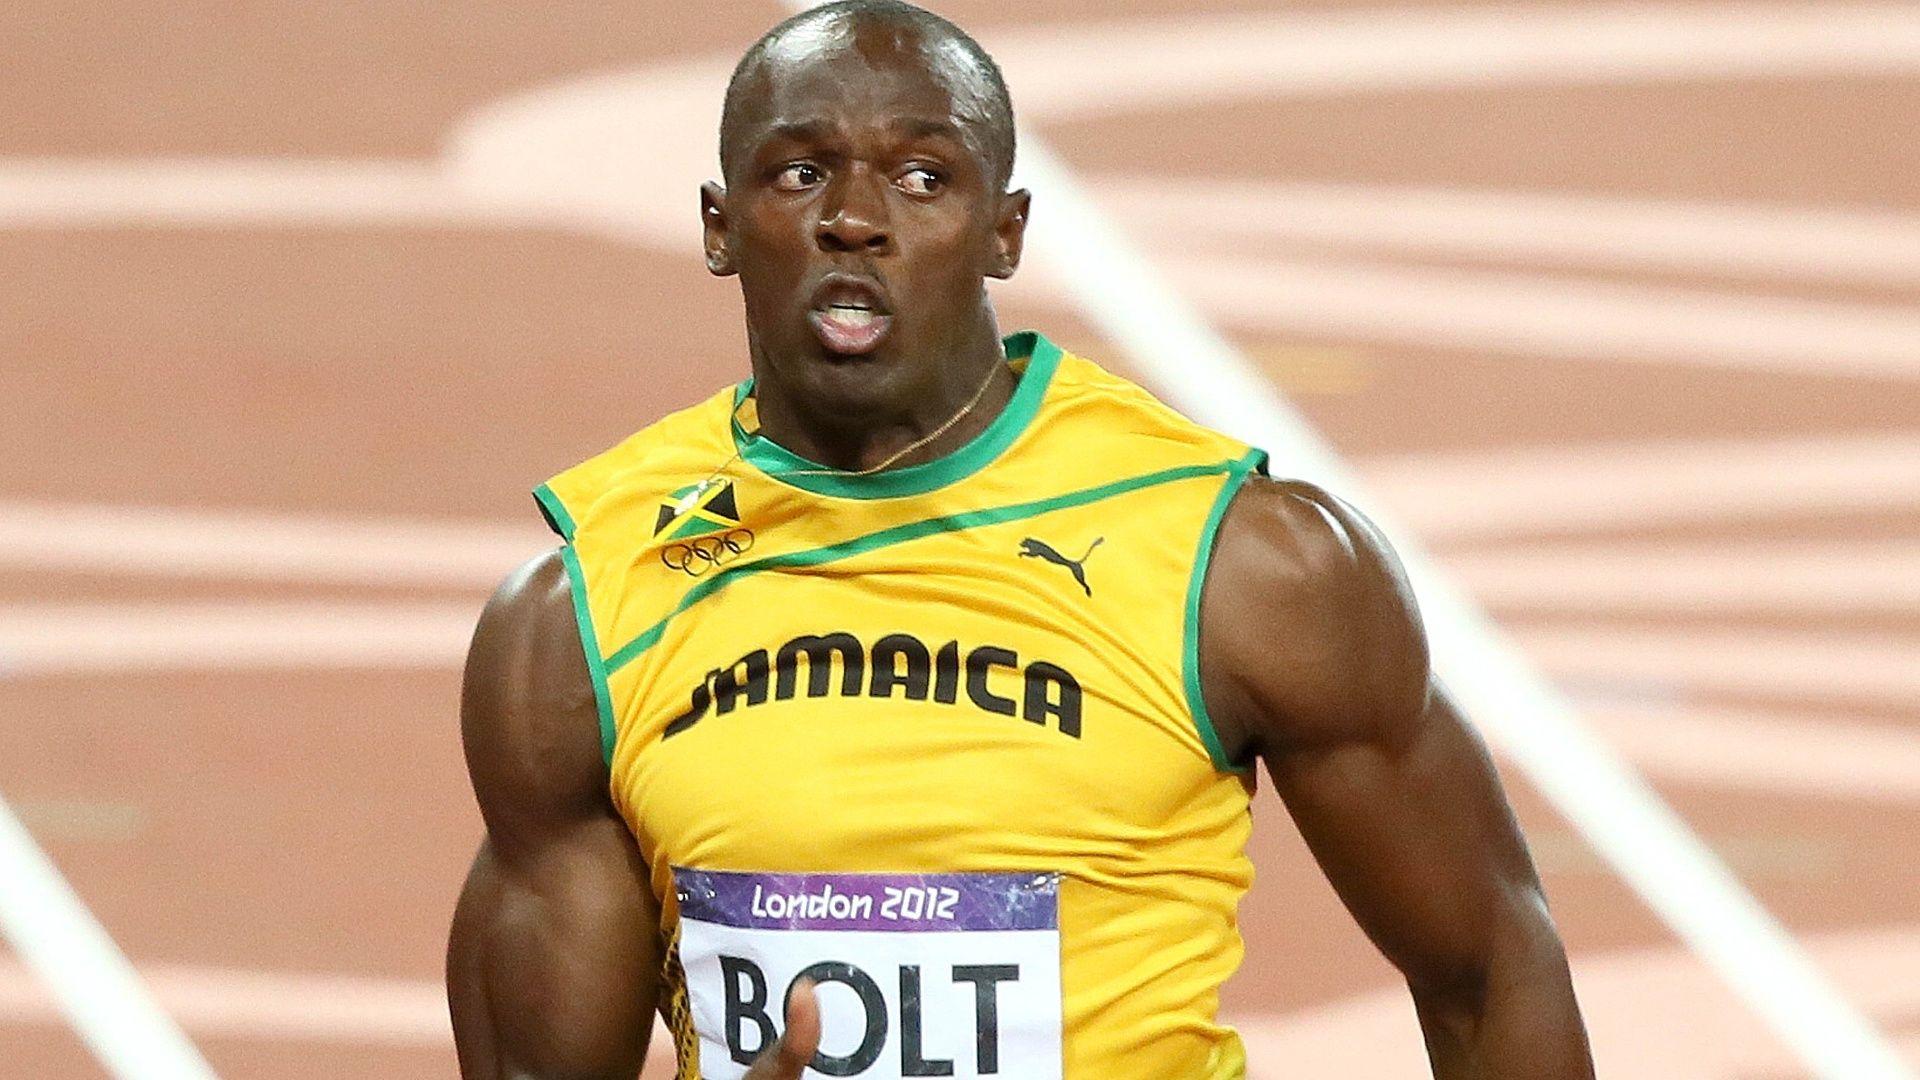 Usain Bolt se despega en encuesta deportiva de PL